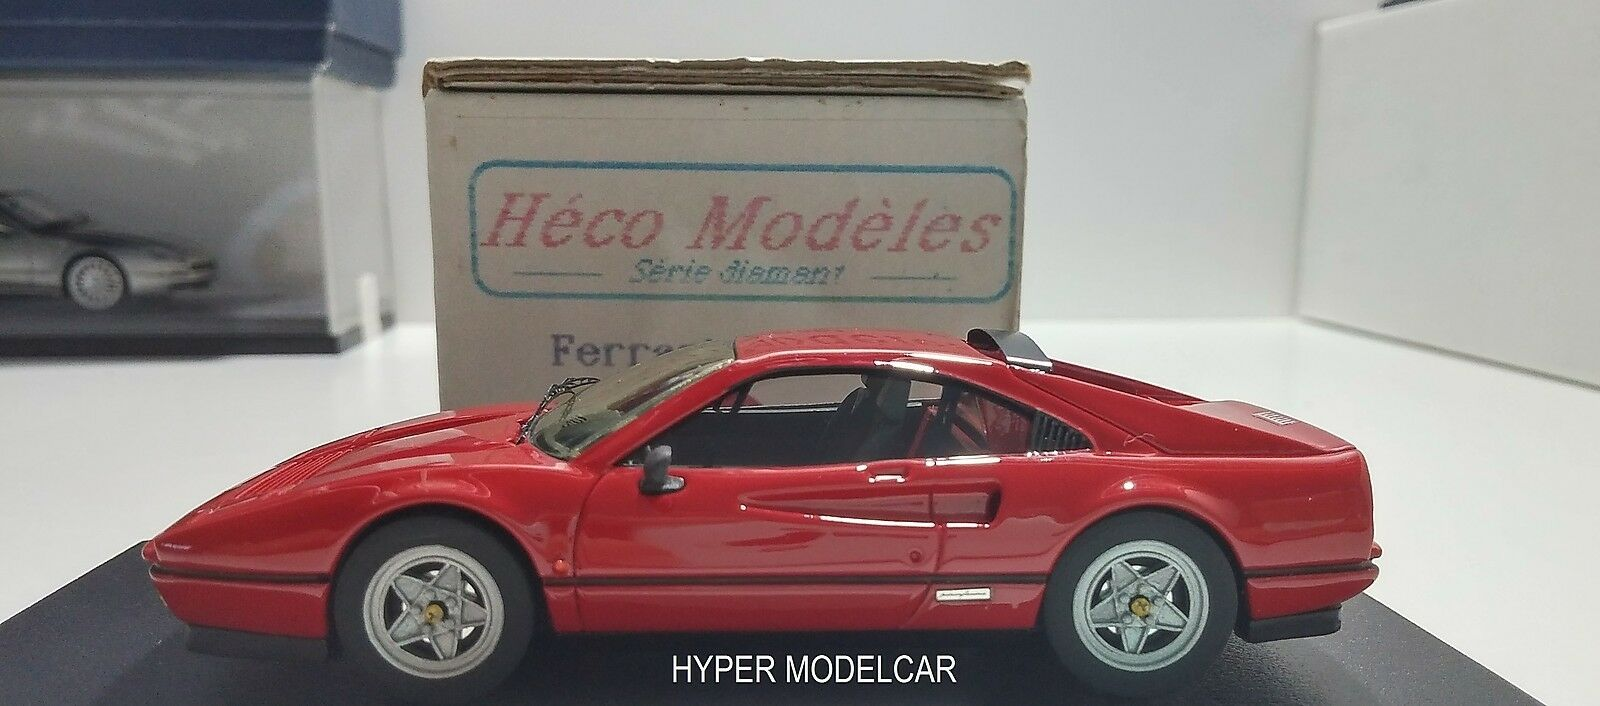 HECO MODELES 1 43 Ferrari 328 GTB 1987 rouge Art. 153 - no bbr